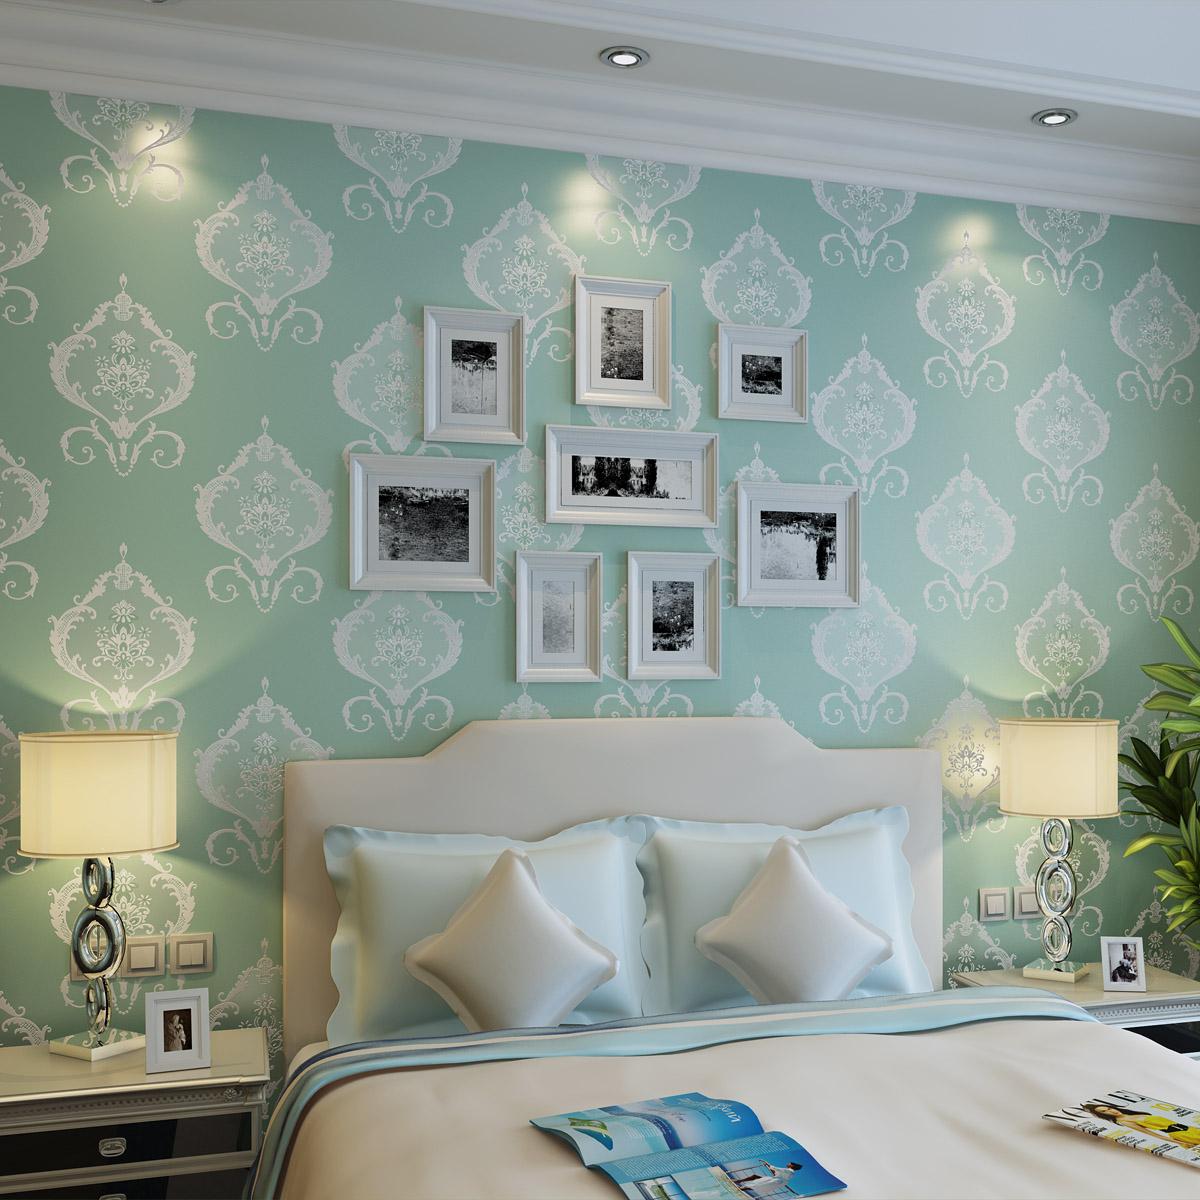 slaapkamer groen blauw ~ lactate for ., Deco ideeën